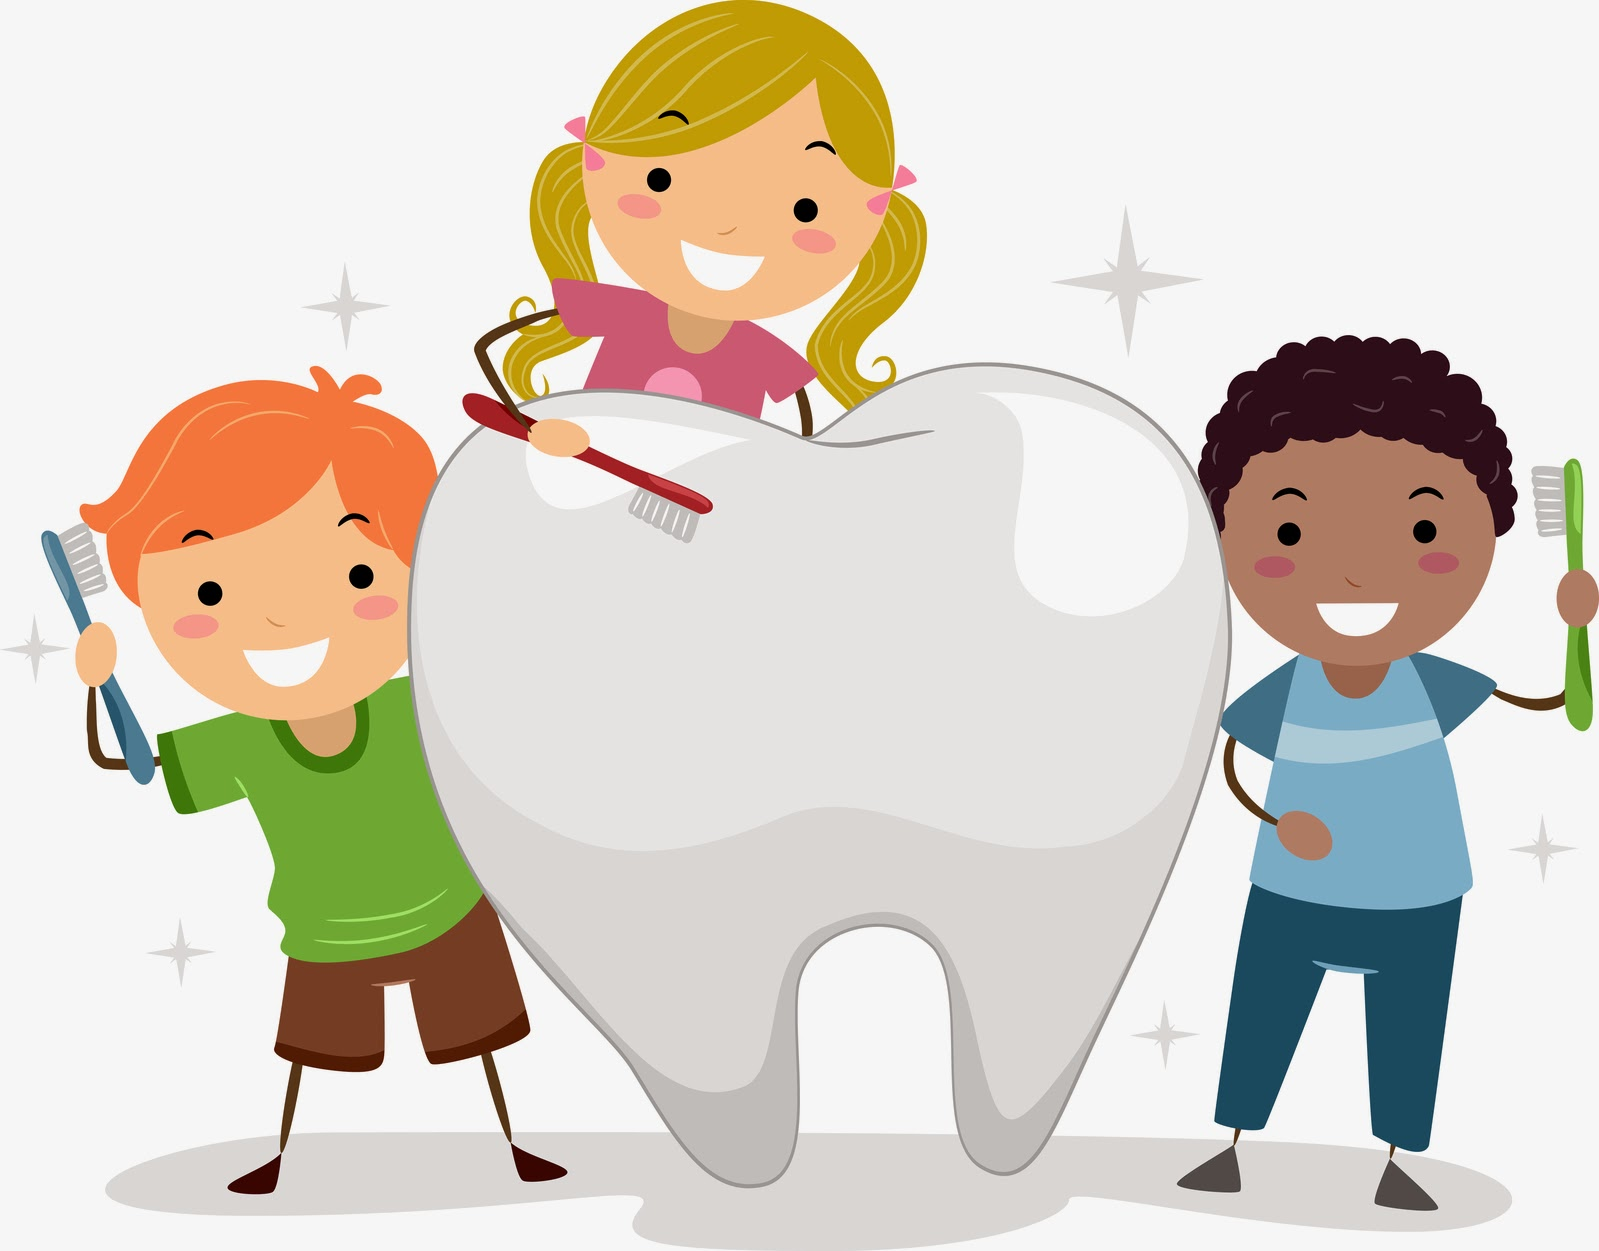 Children teeth clipart banner royalty free stock Healthy Baby Teeth Workshop - City of Waterville, Maine banner royalty free stock